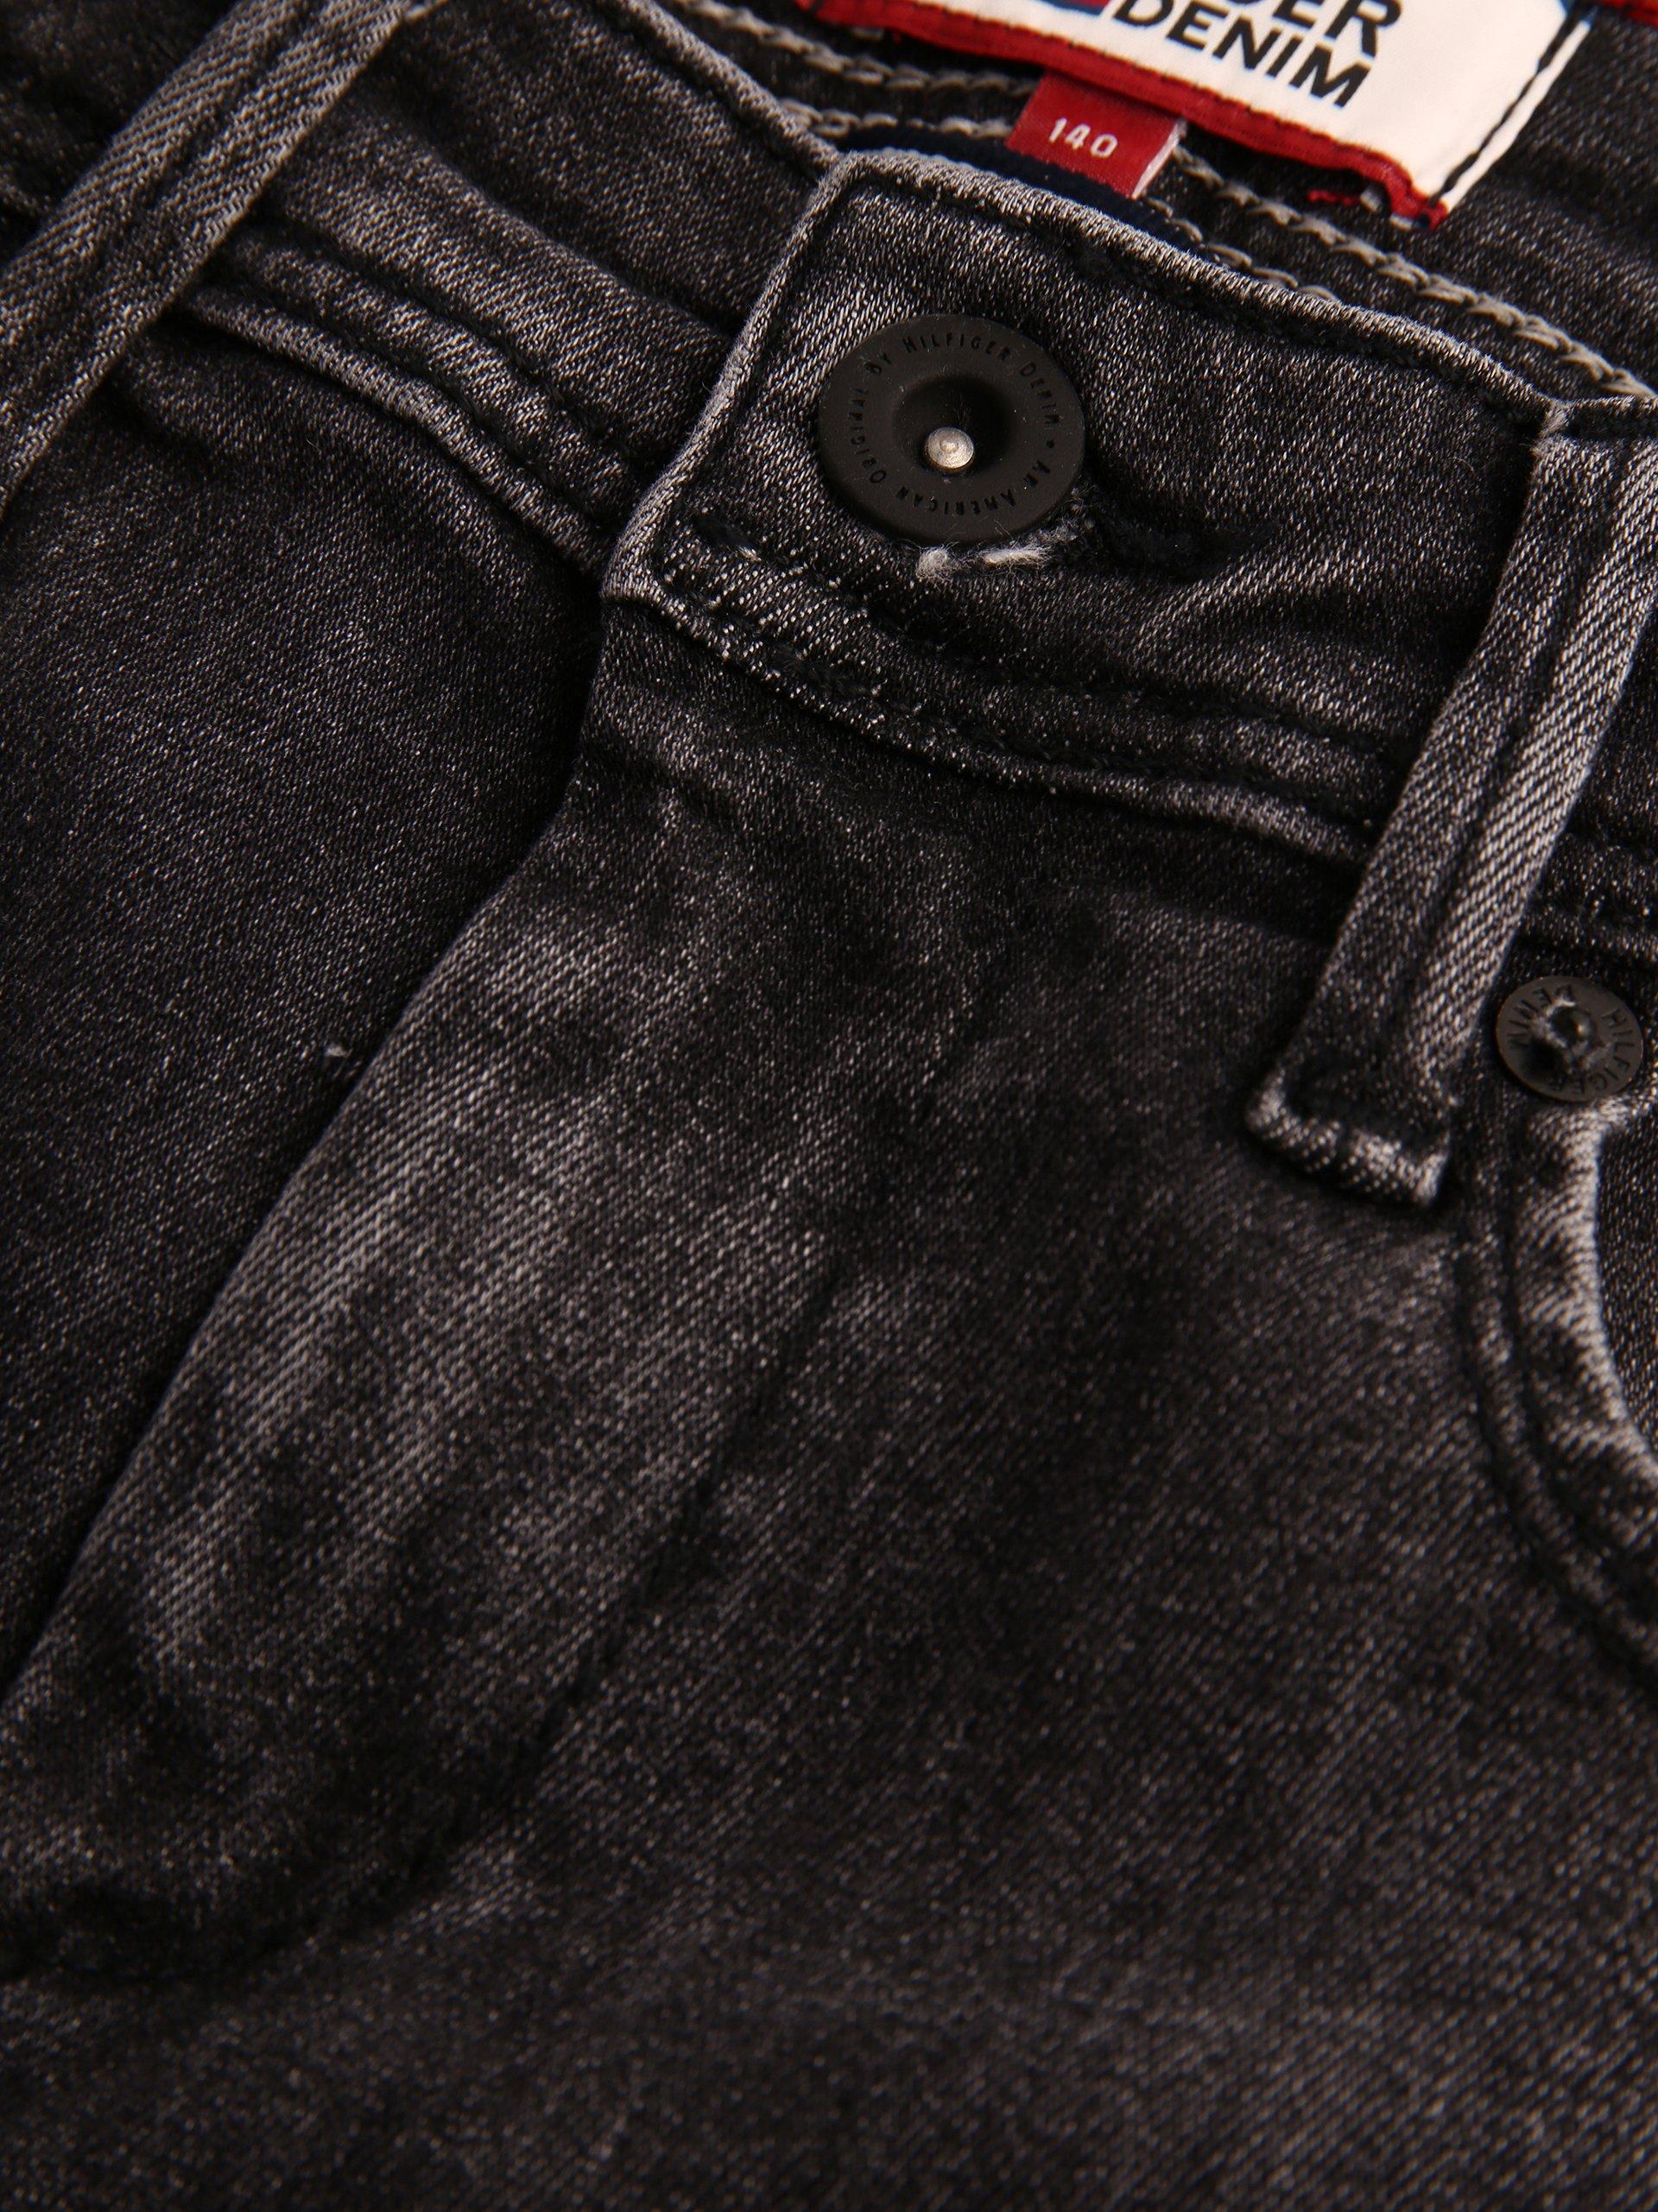 Tommy Hilfiger Jungen Jeans Skinny Fit - Saxton anthrazit uni online ... 361e9dfe78